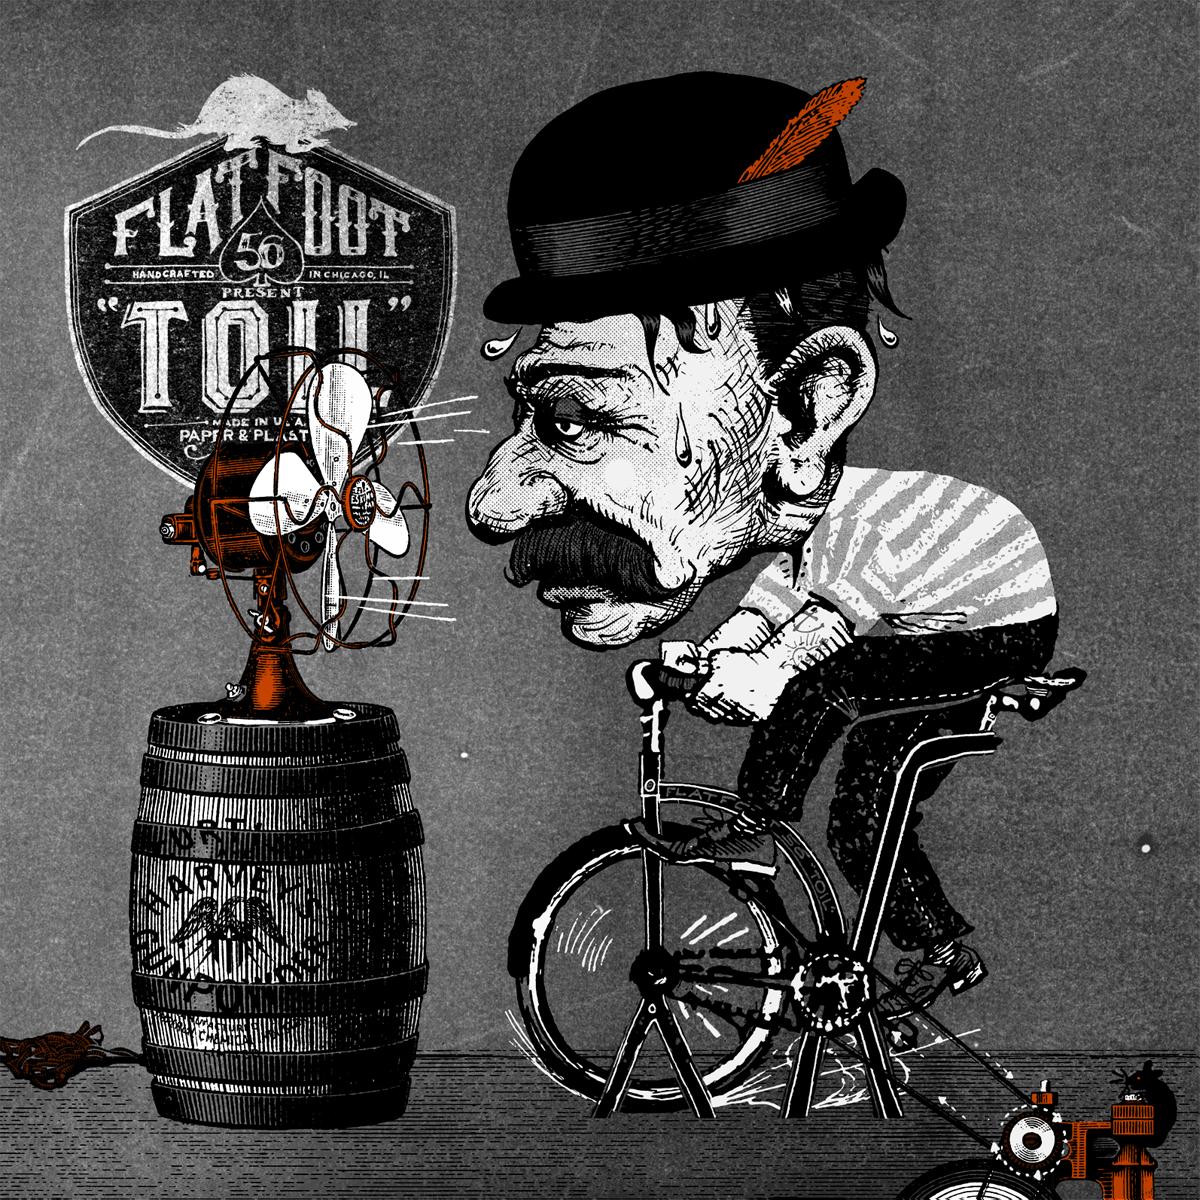 Flatfoot 56 - Toil (CD, MP3, FLAC)